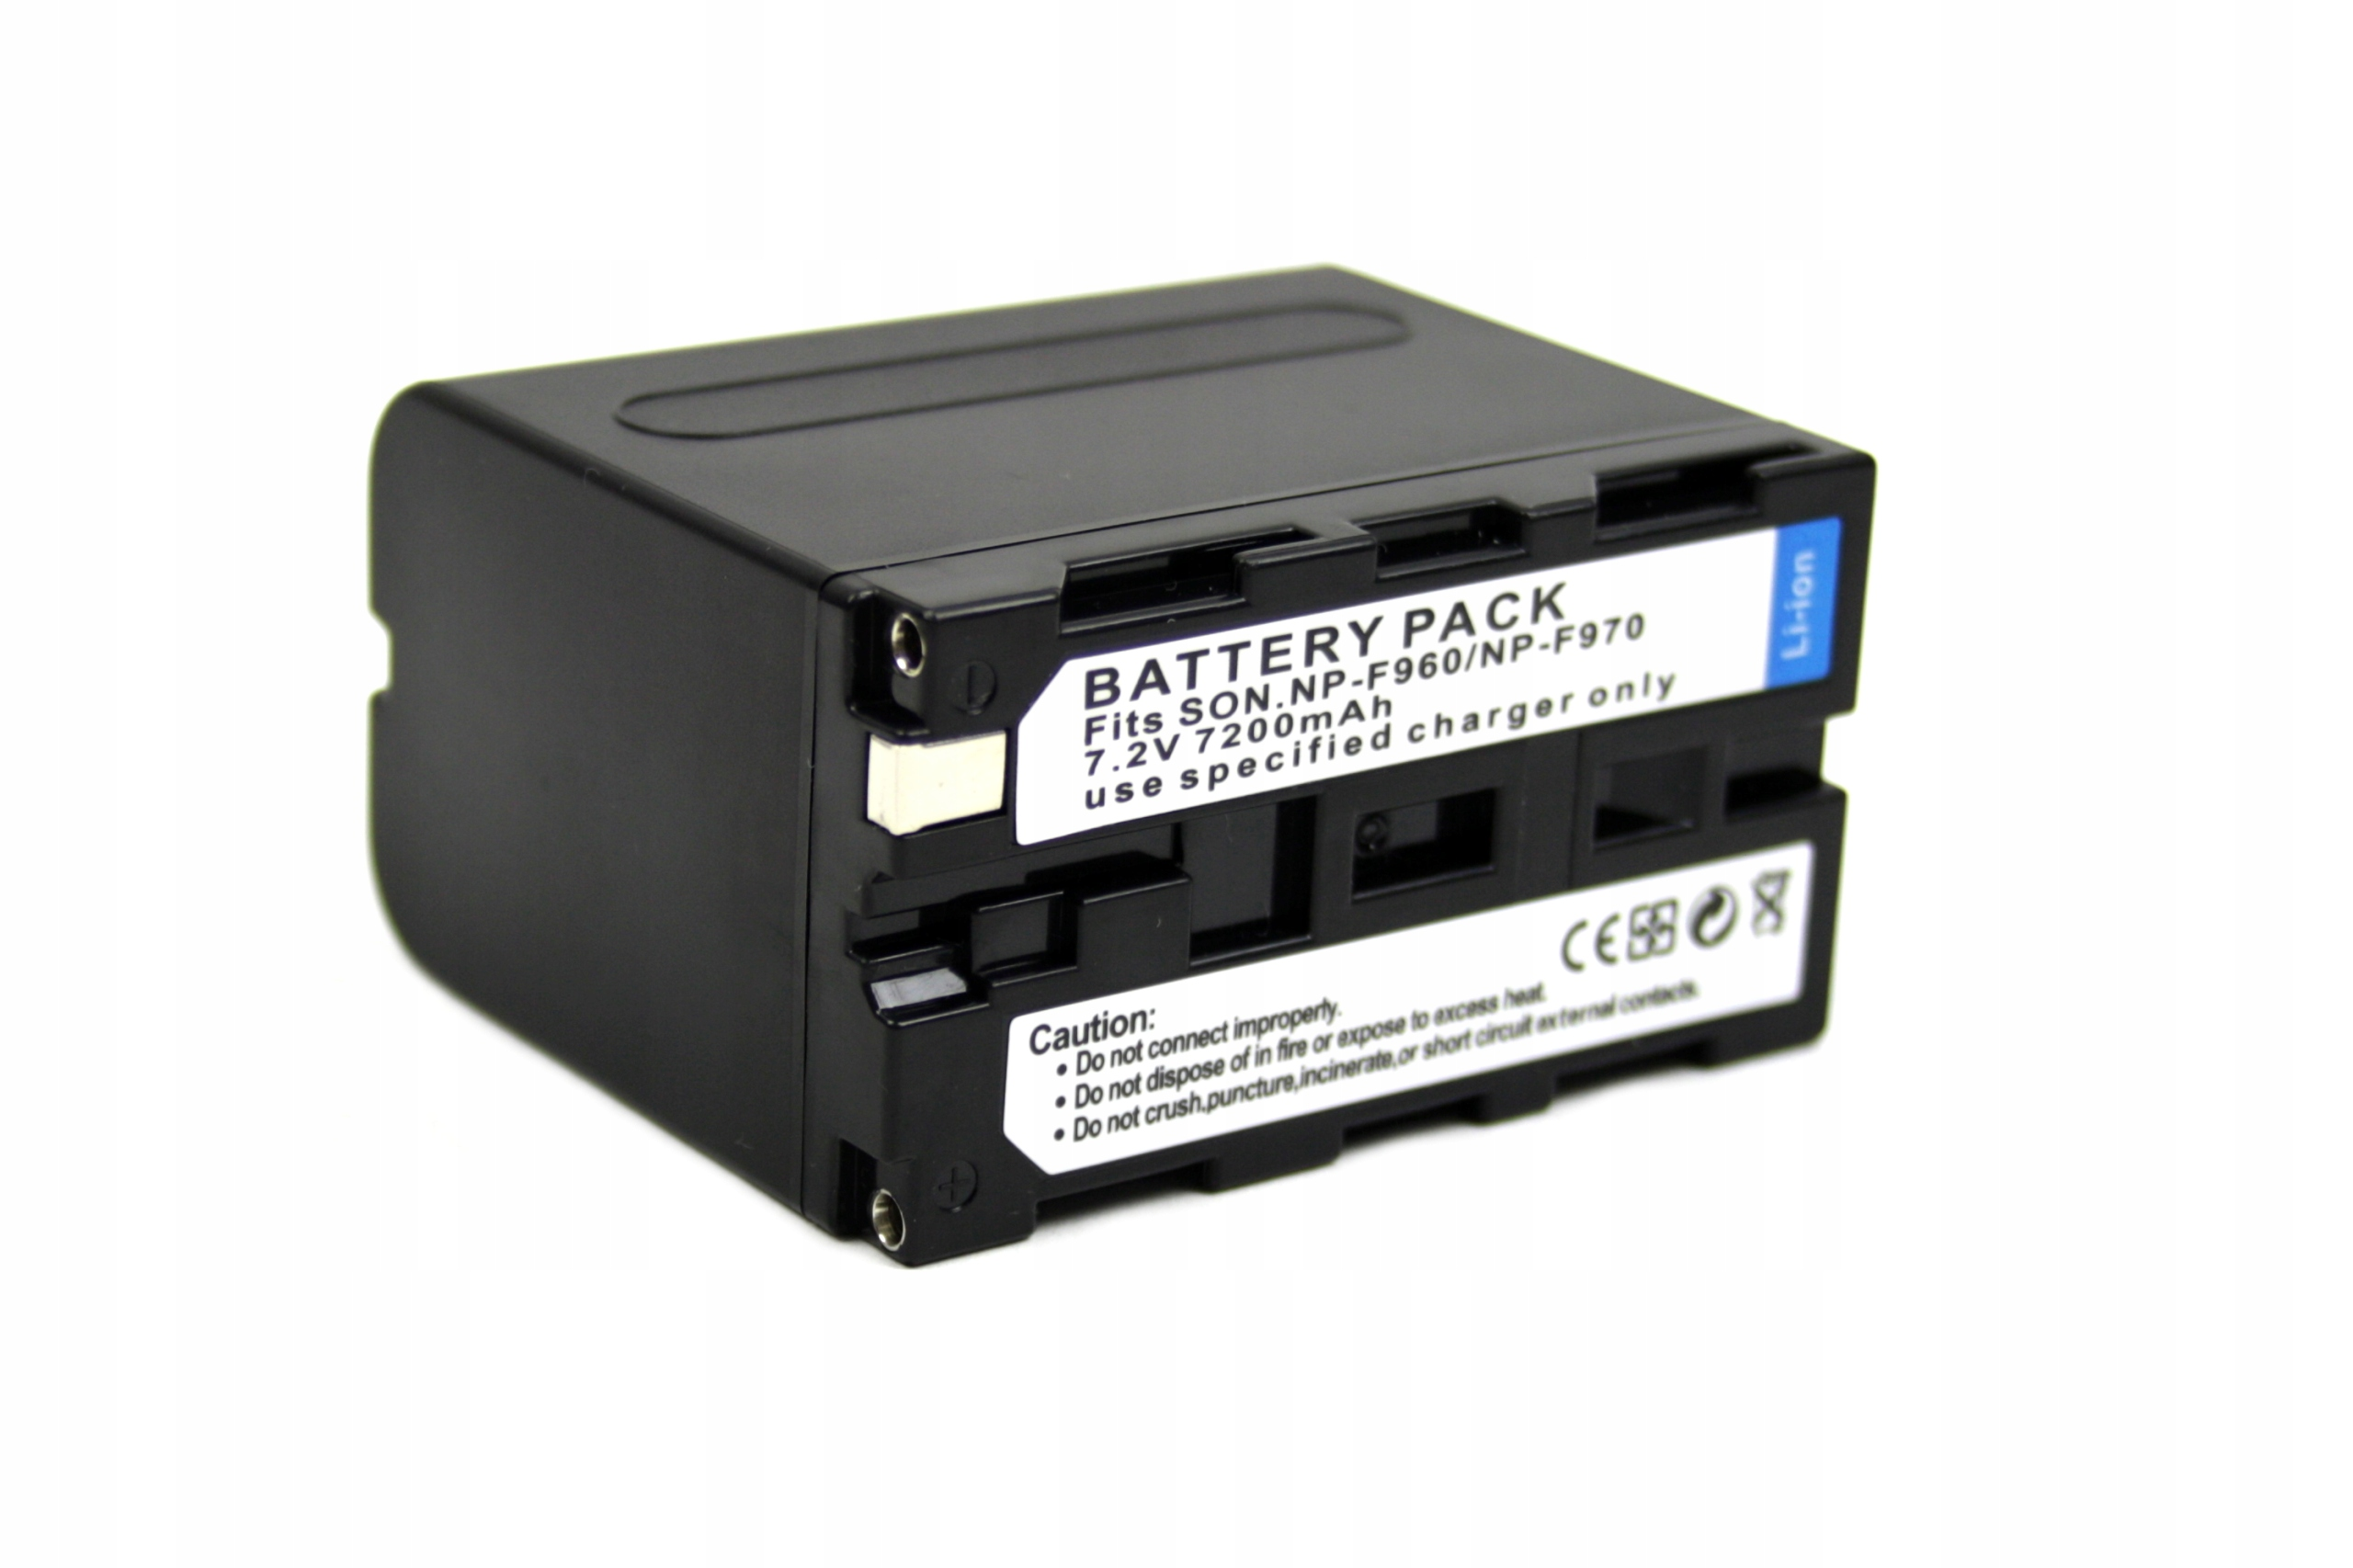 BATERIA SONY NP-F970 NP-F960 NP-F550 NP-F750 NP-F530 AKUMULATOR 7200 MAH - Baterie do aparatów cyfrowych